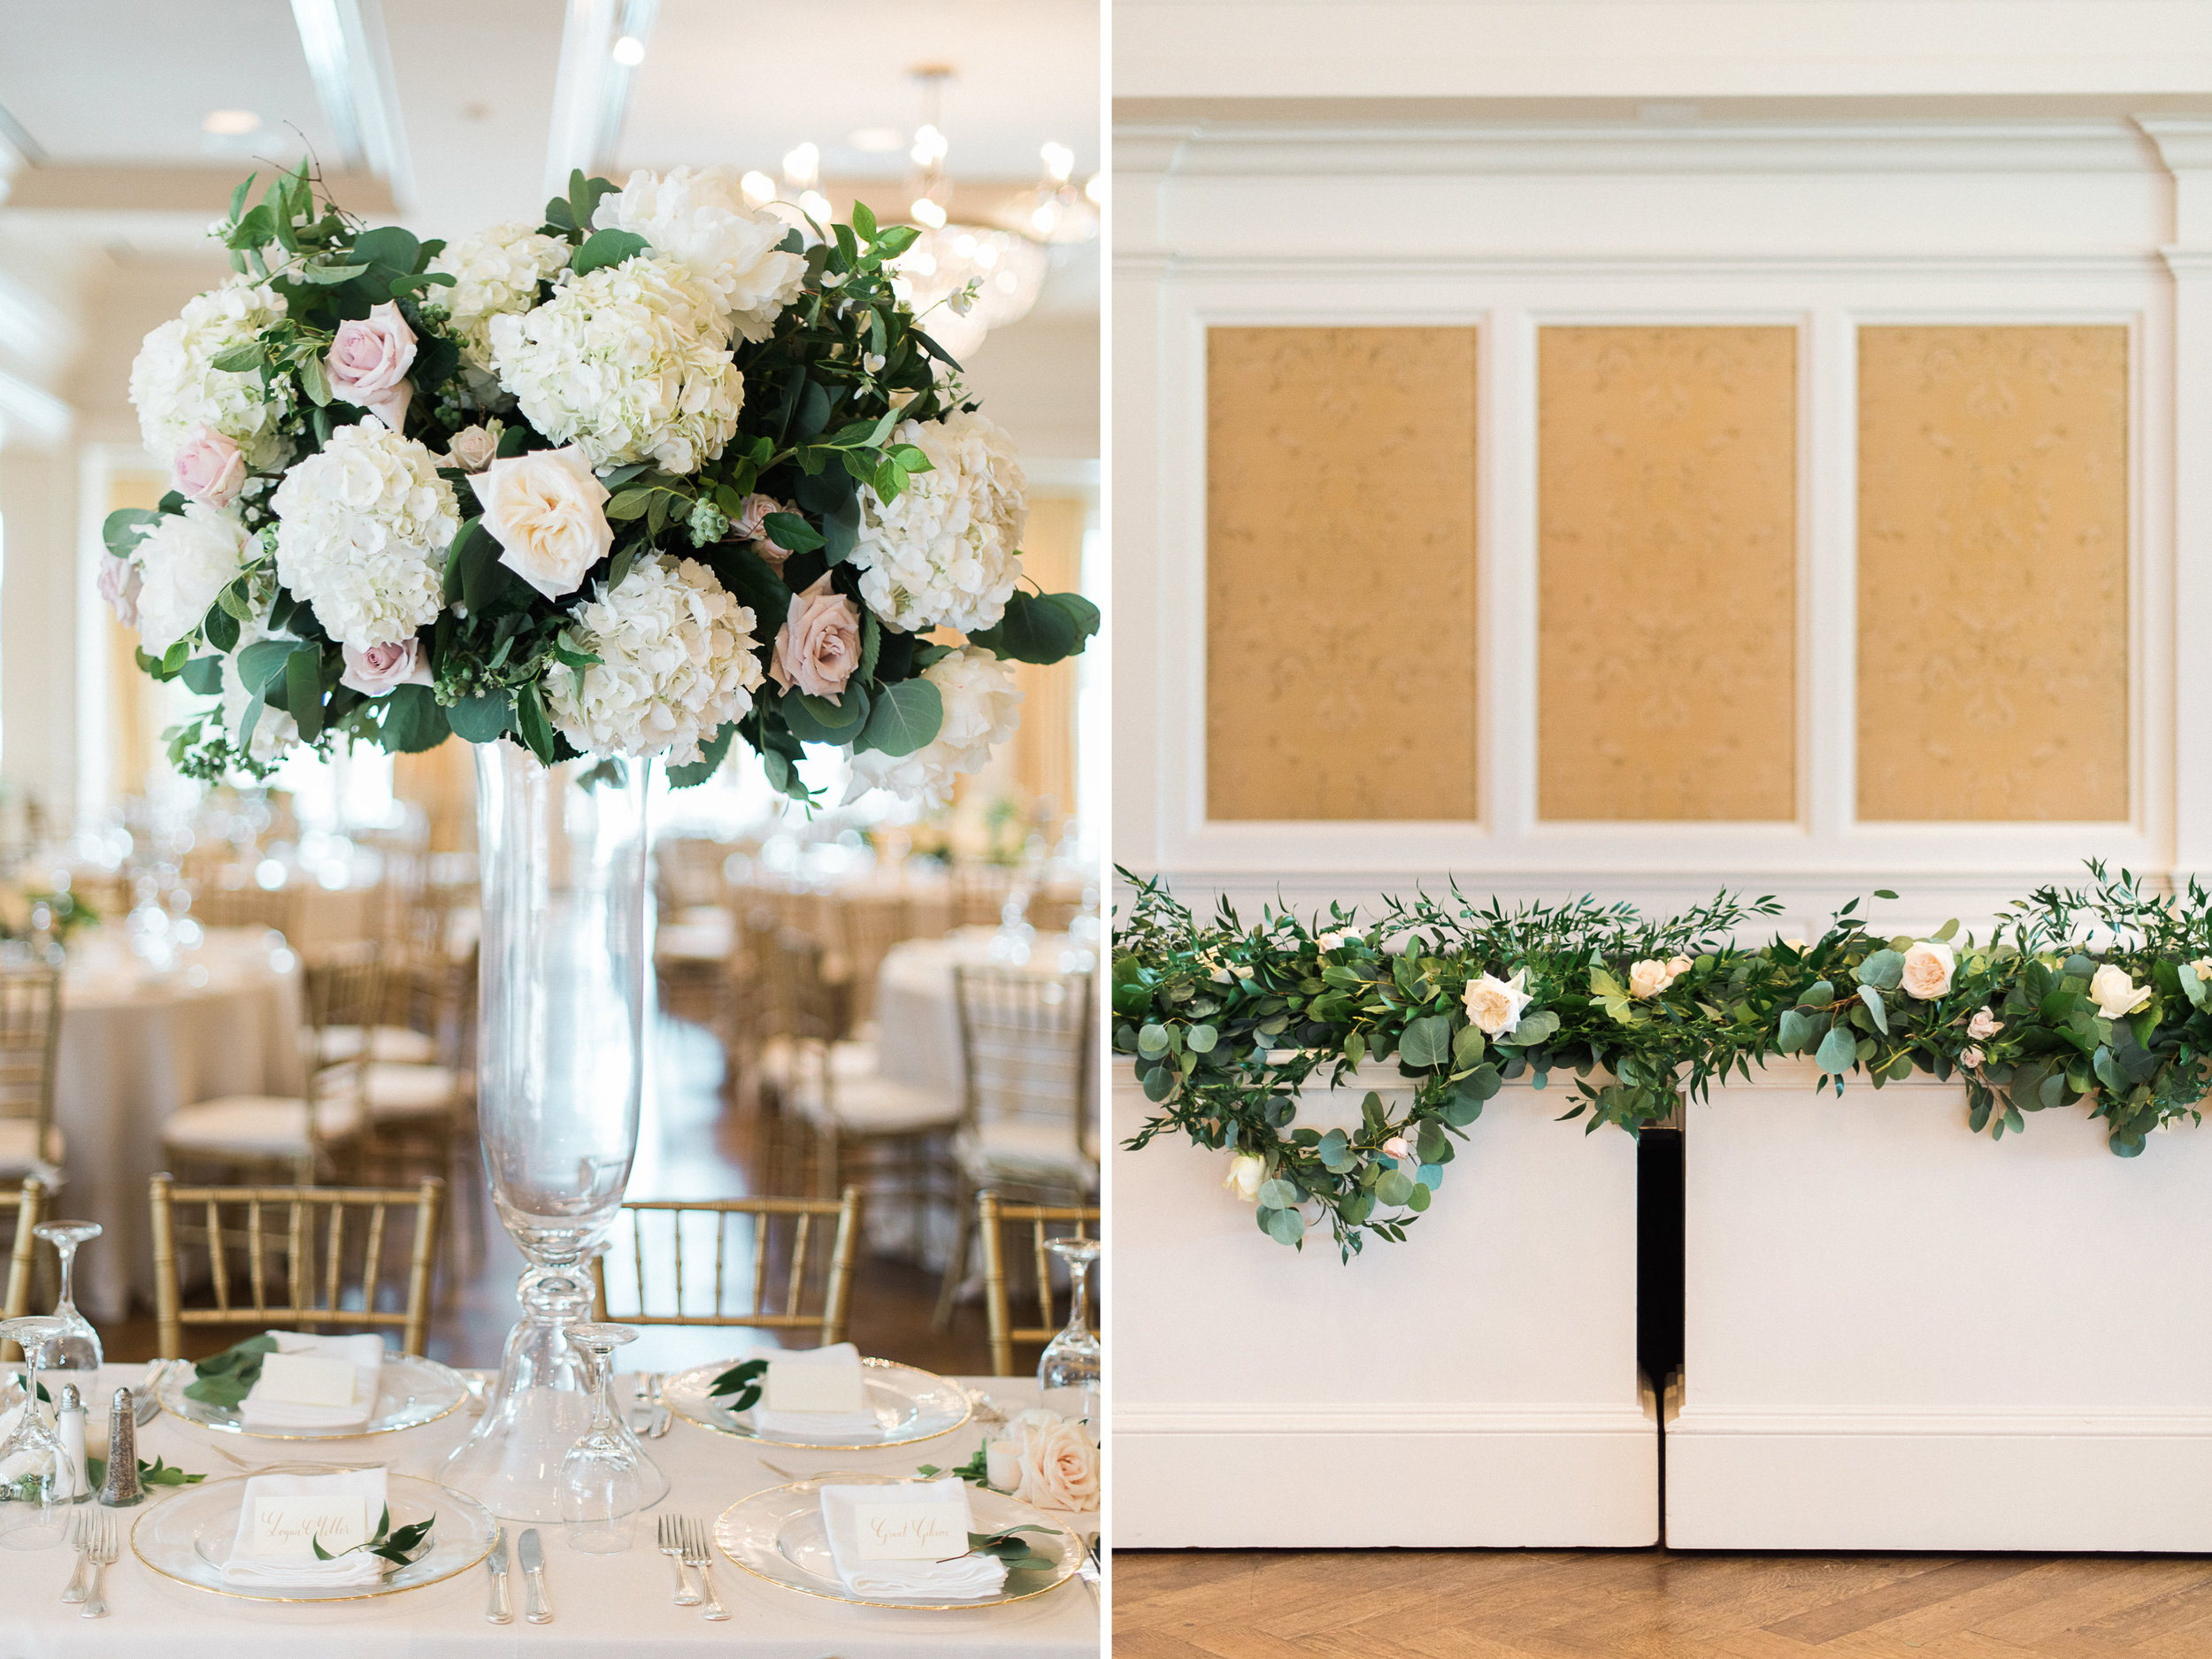 Fine-Art-Film-Houston-Wedding-Photographer-Best-Top-Luxury-Texas-Austin-Dallas-Destination-Dana-Fernandez-Photography-River-Oaks-Country-Club-South-Main-Baptist-Ceremony-Reception-Wedding-119.jpg